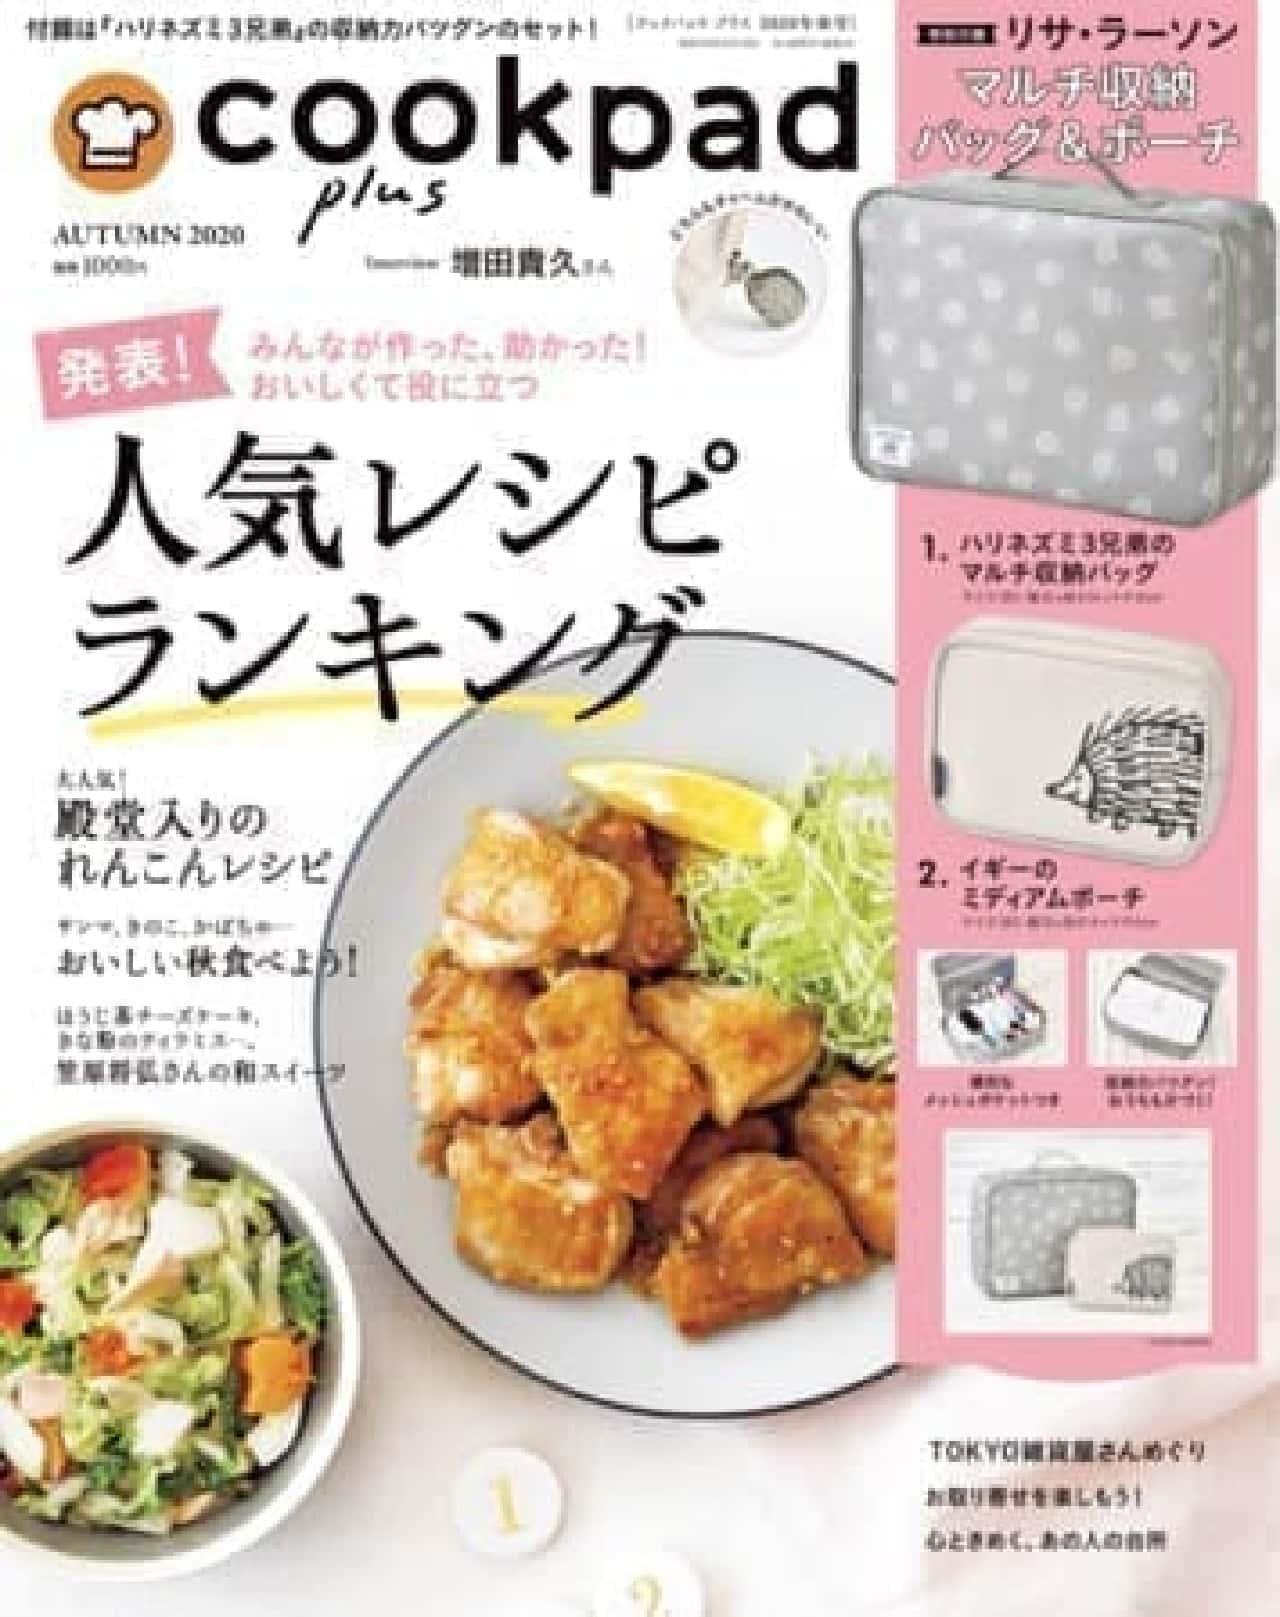 「cookpad plus(クックパッド プラス)」2020年秋号